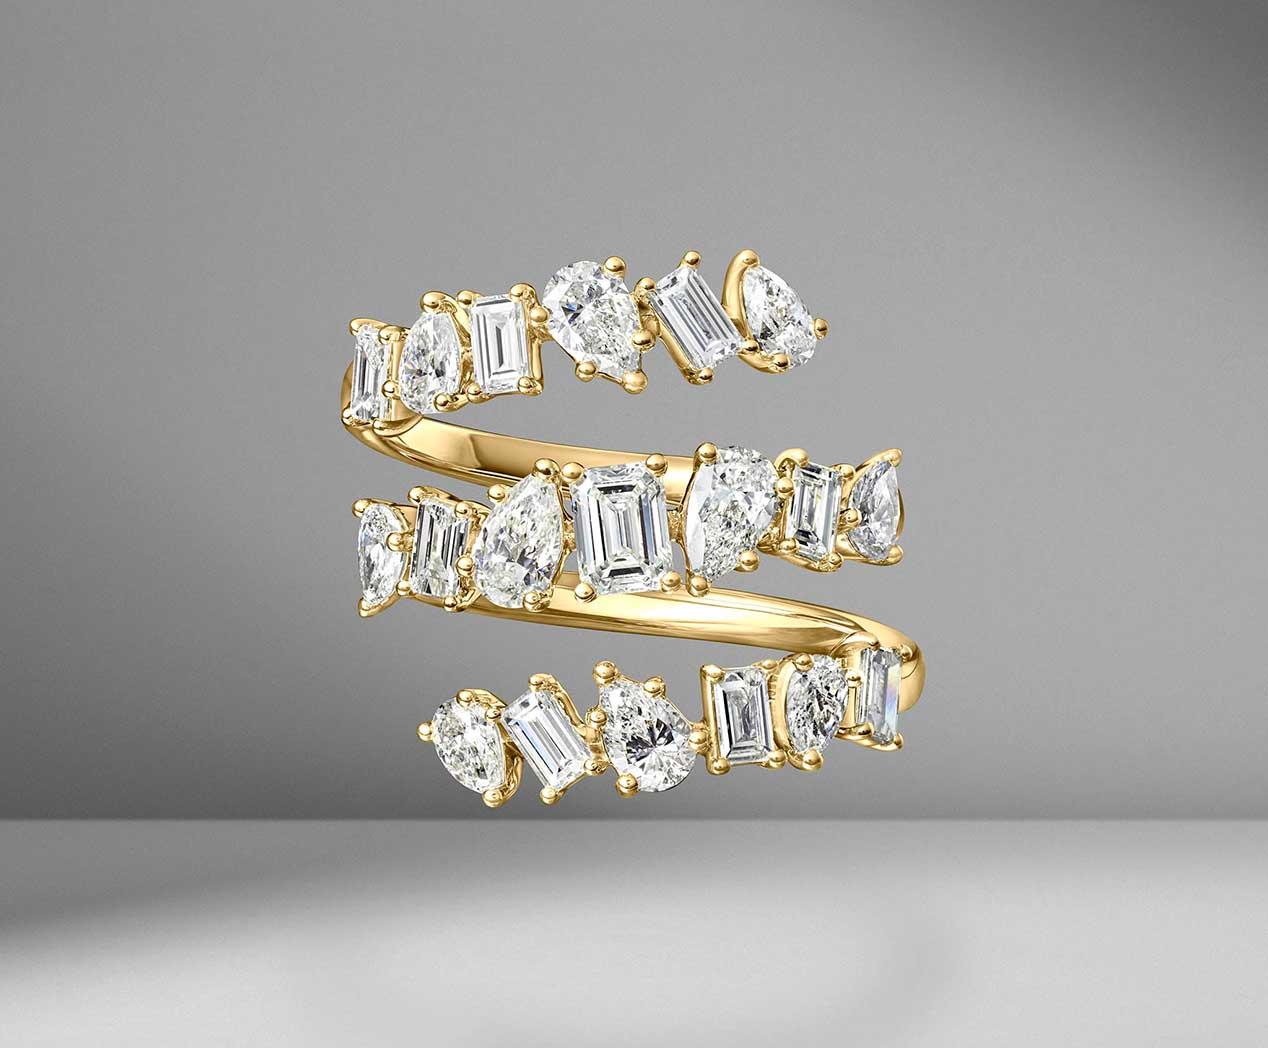 MG-Ring-multi-Shape-diamond-3-row-P-16278-angle-1-YG---Teresa-Panico.jpg